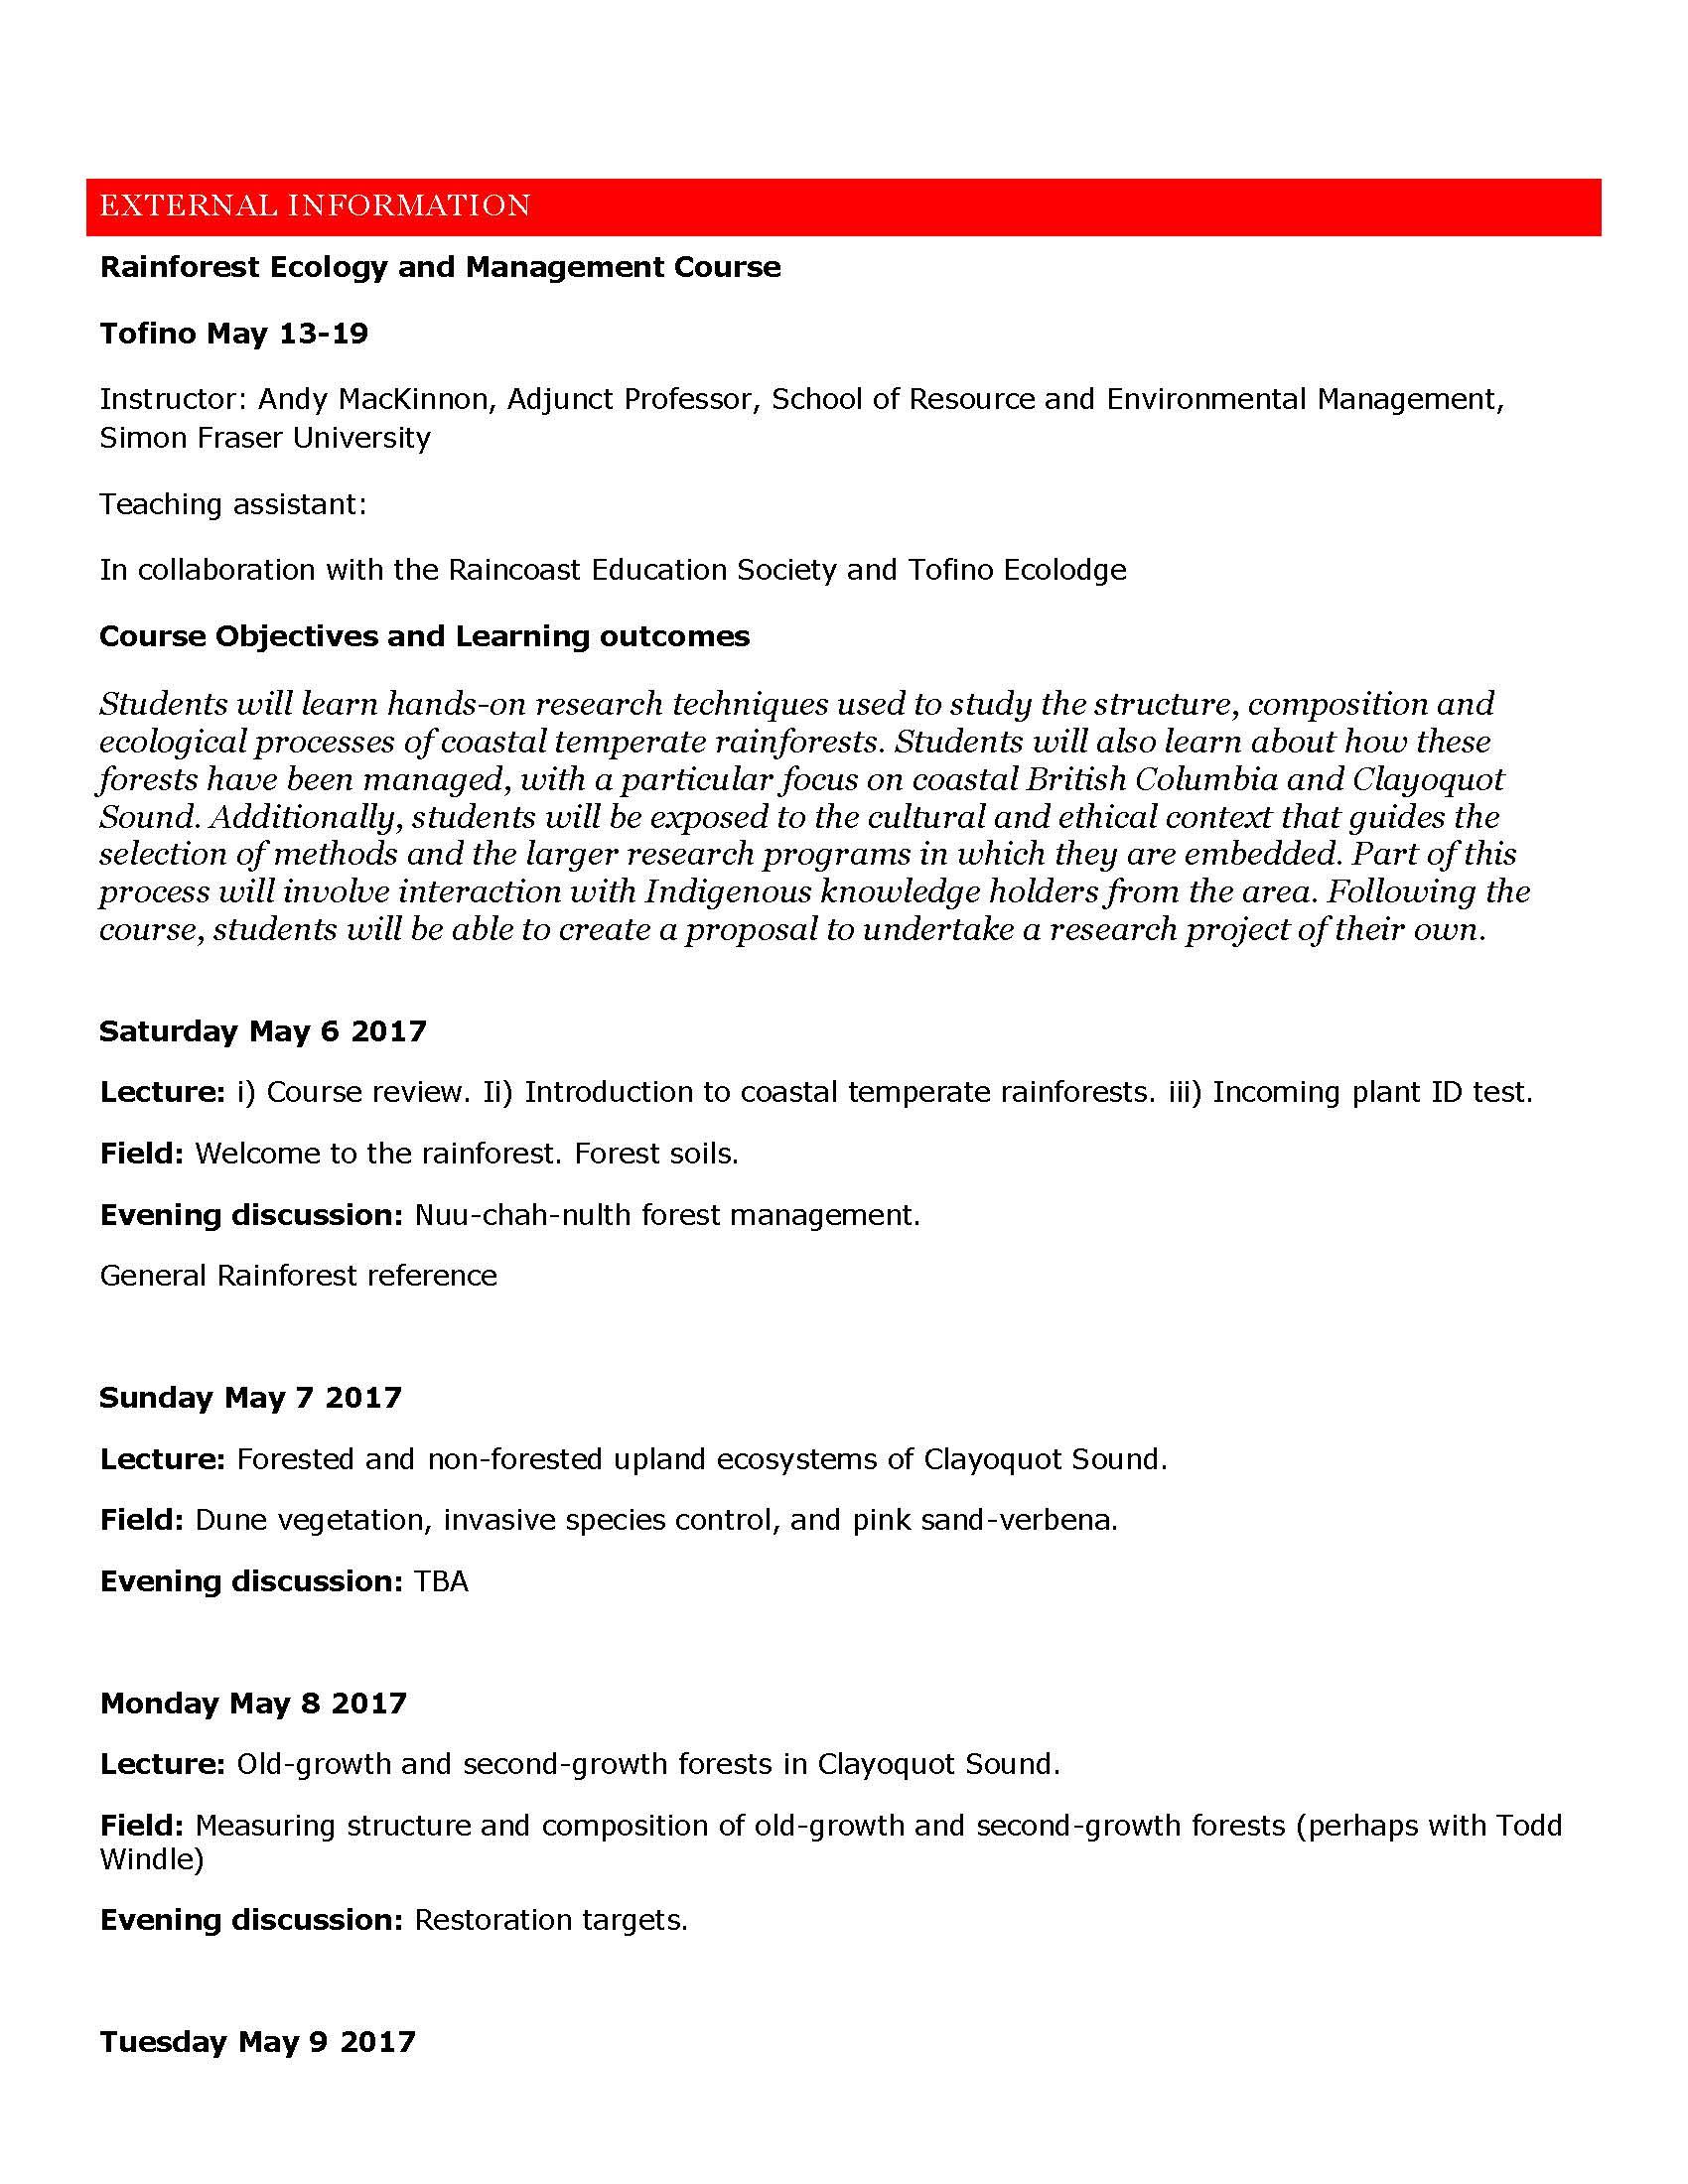 TFN Bulletin March 1 2017_Page_17.jpg